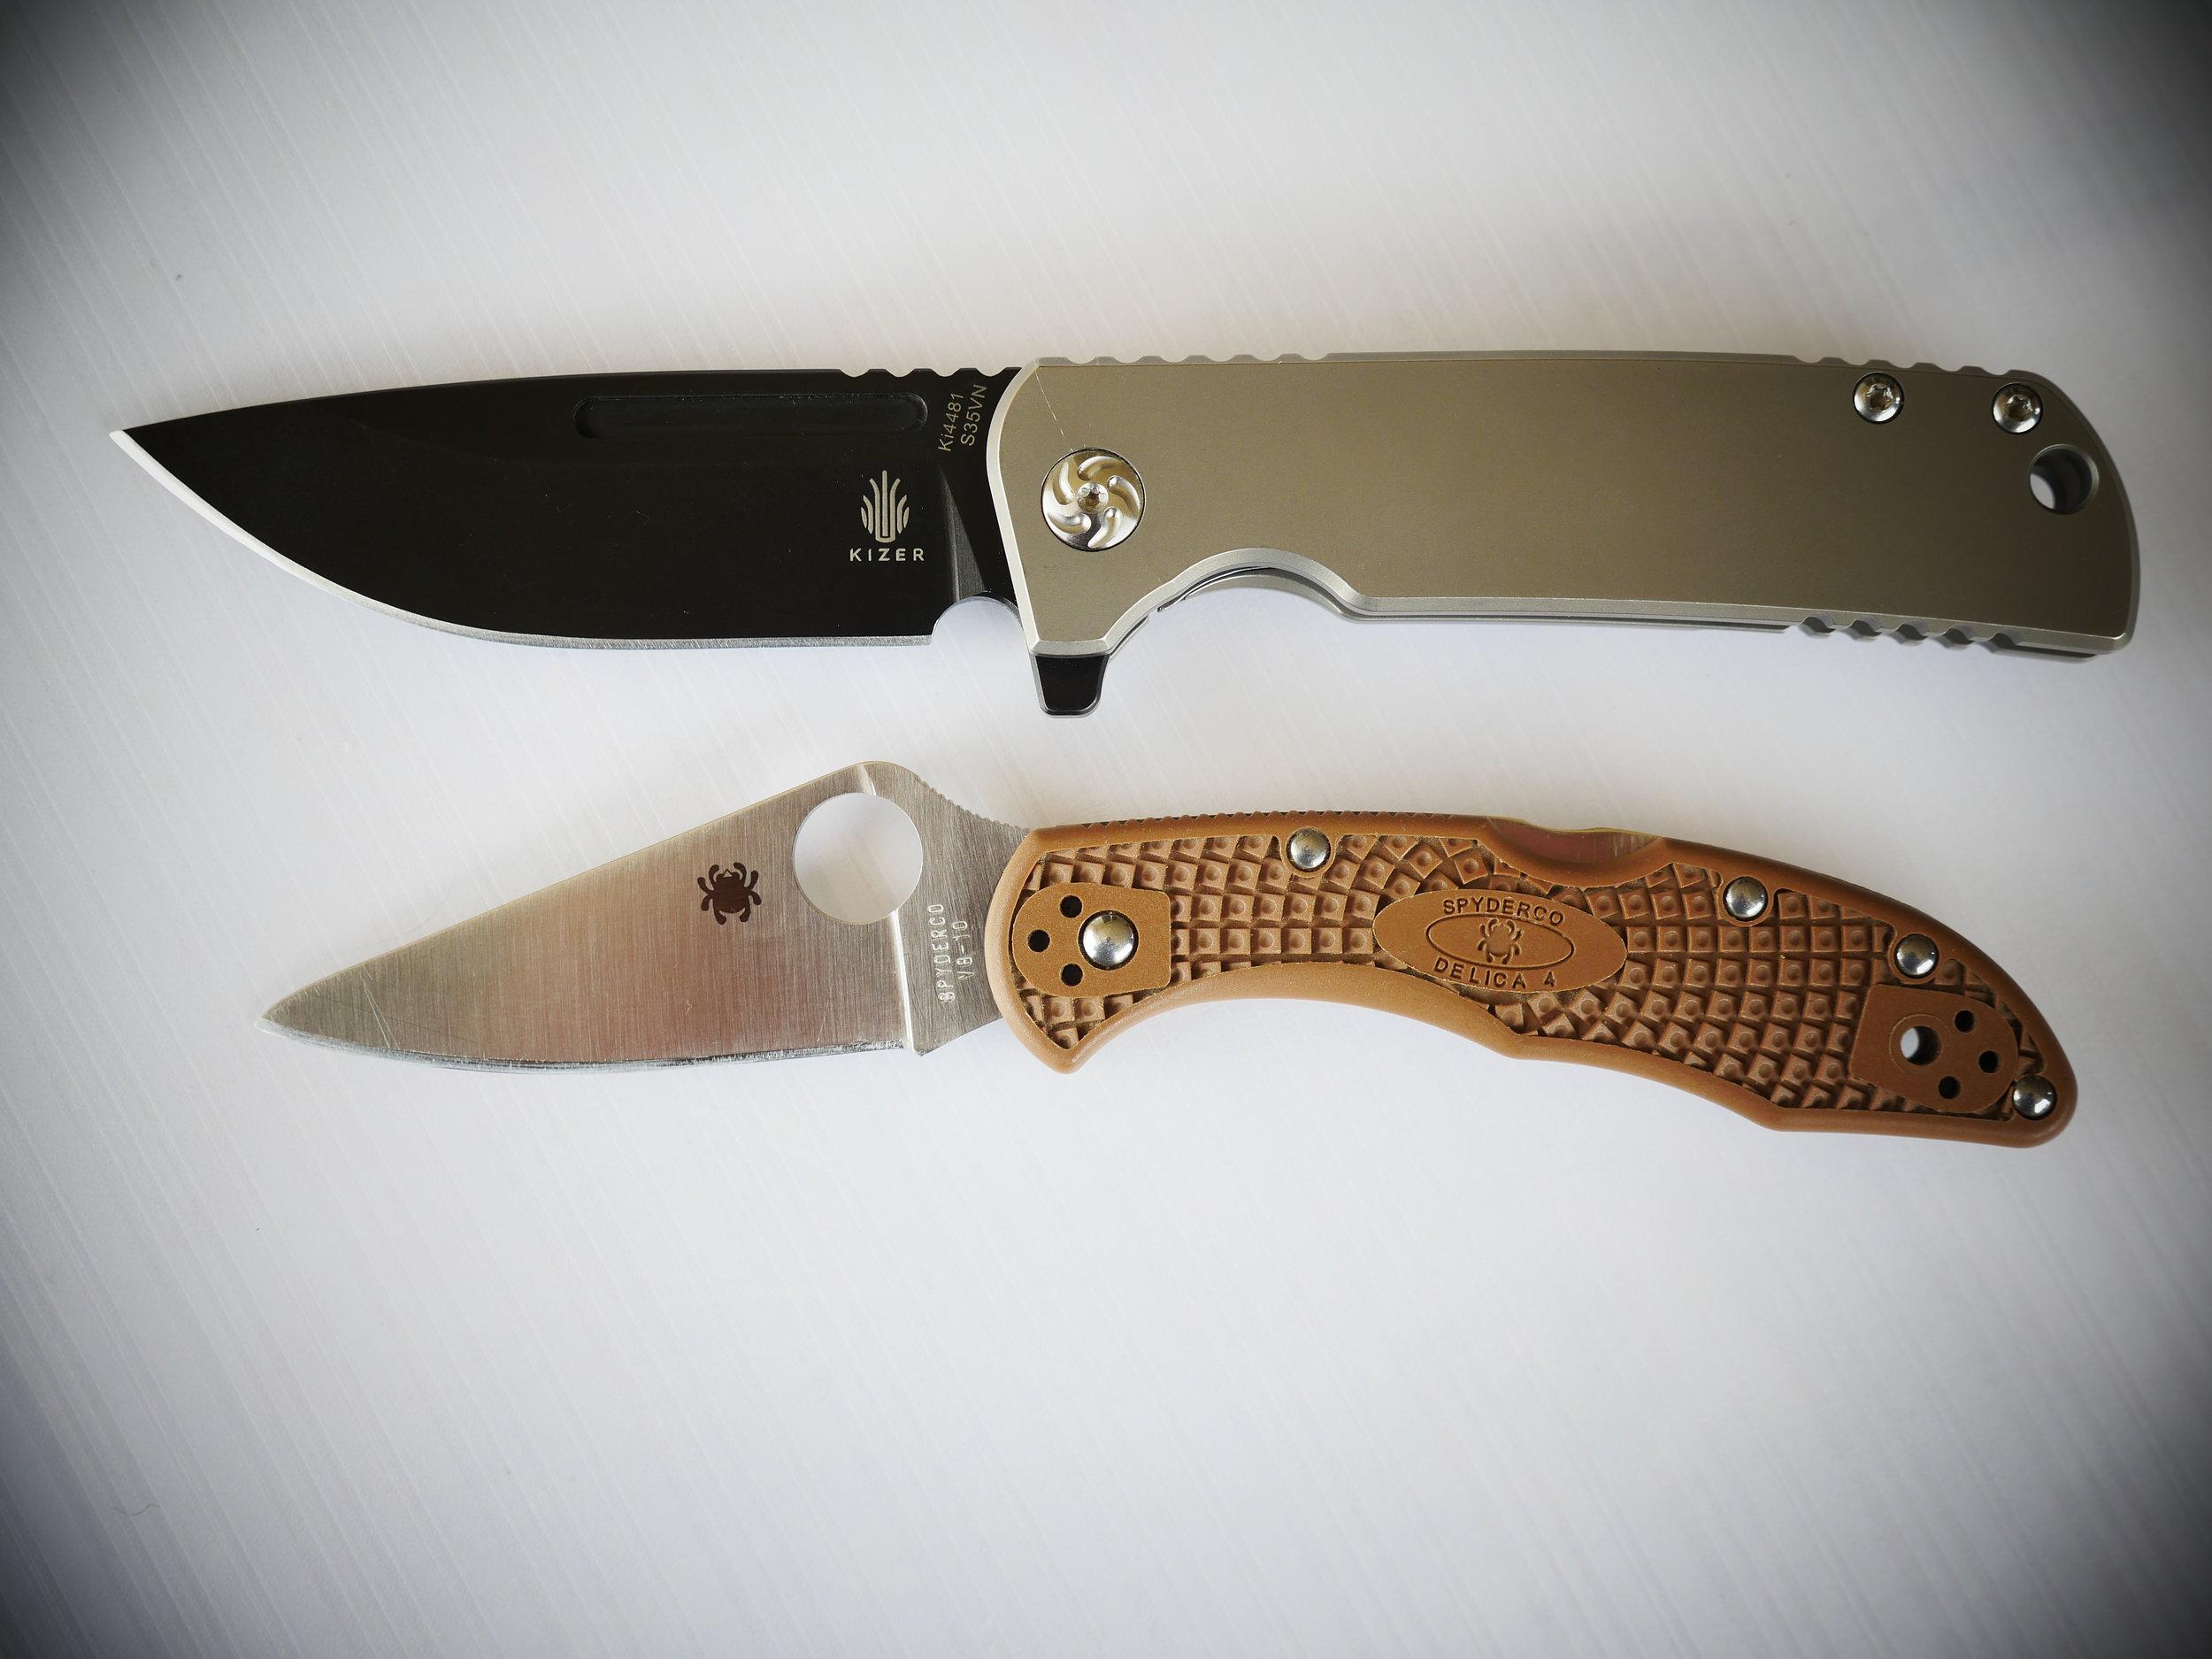 Kizer Escort Size Comparison 1